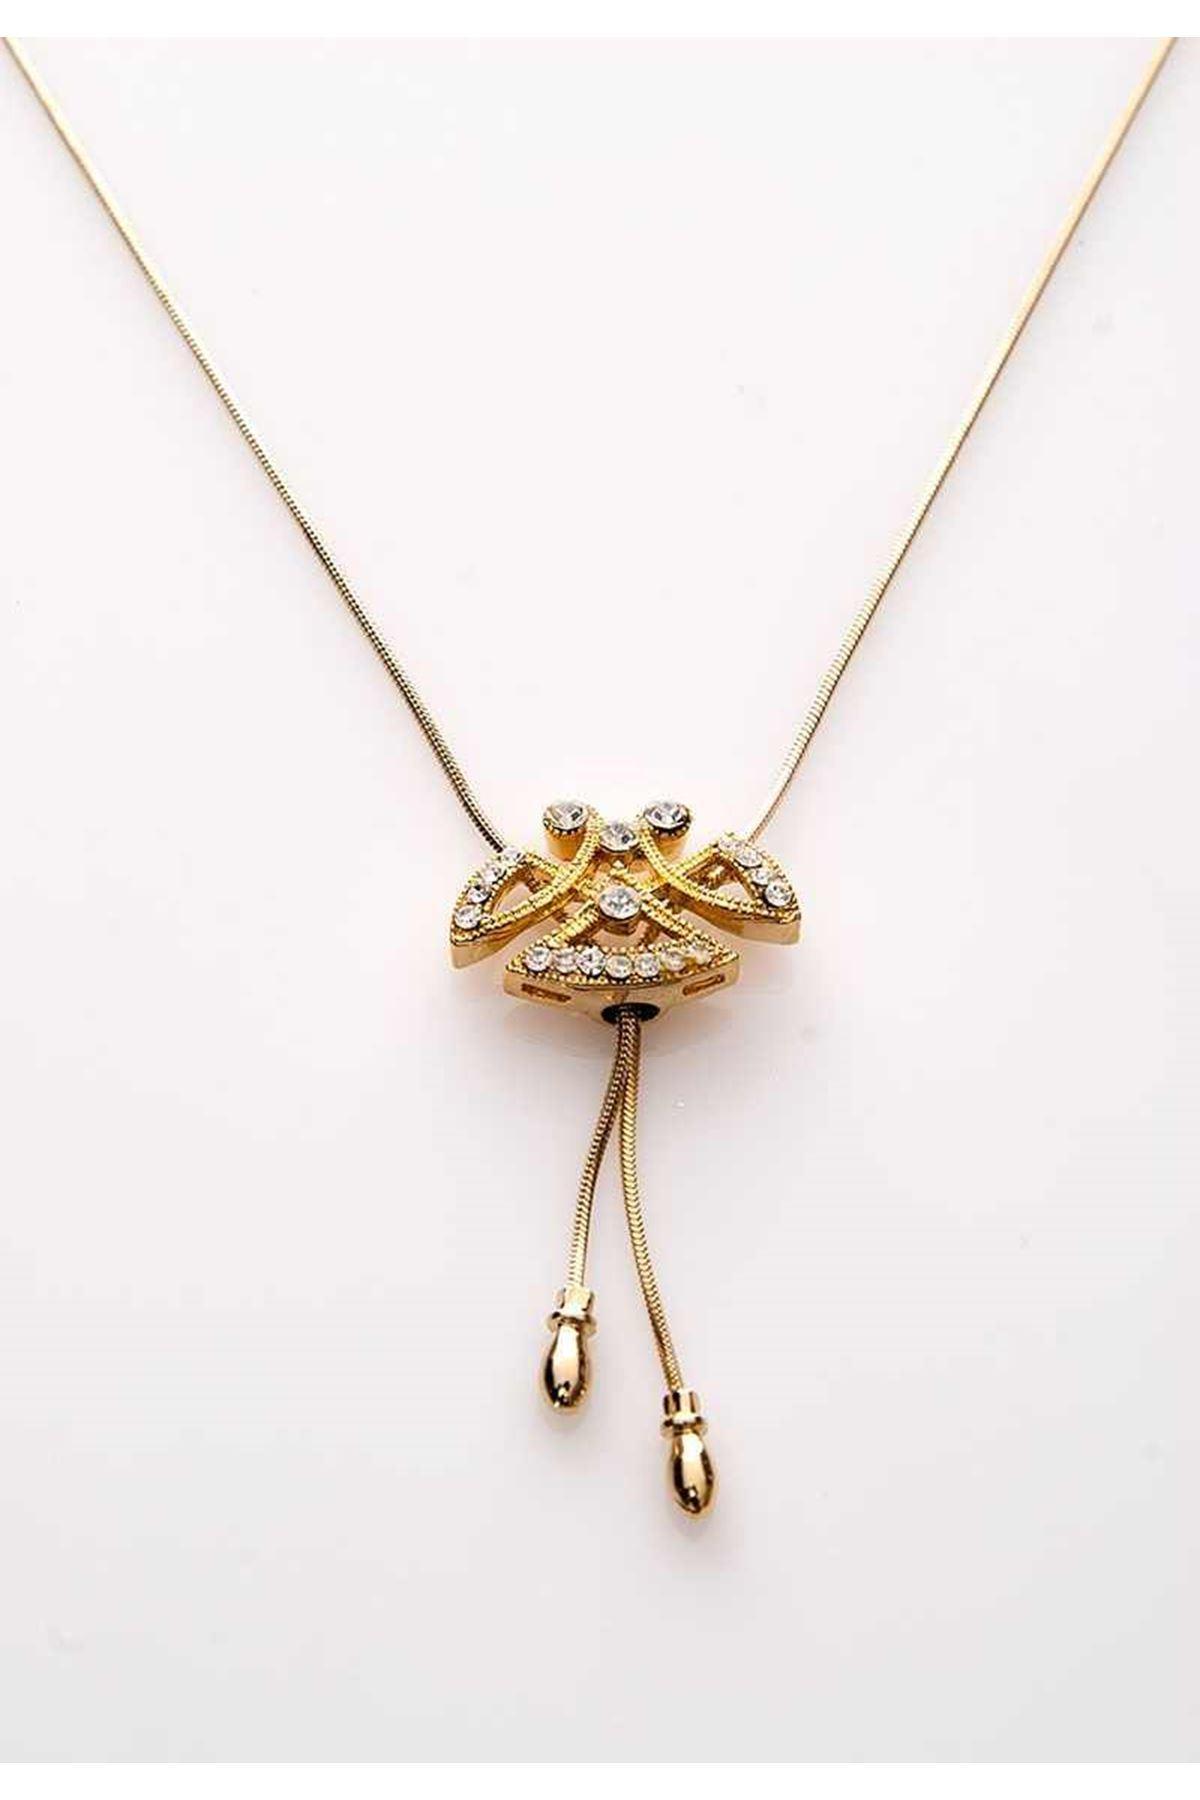 Gold Taşlı Kolye 11Ç-107826